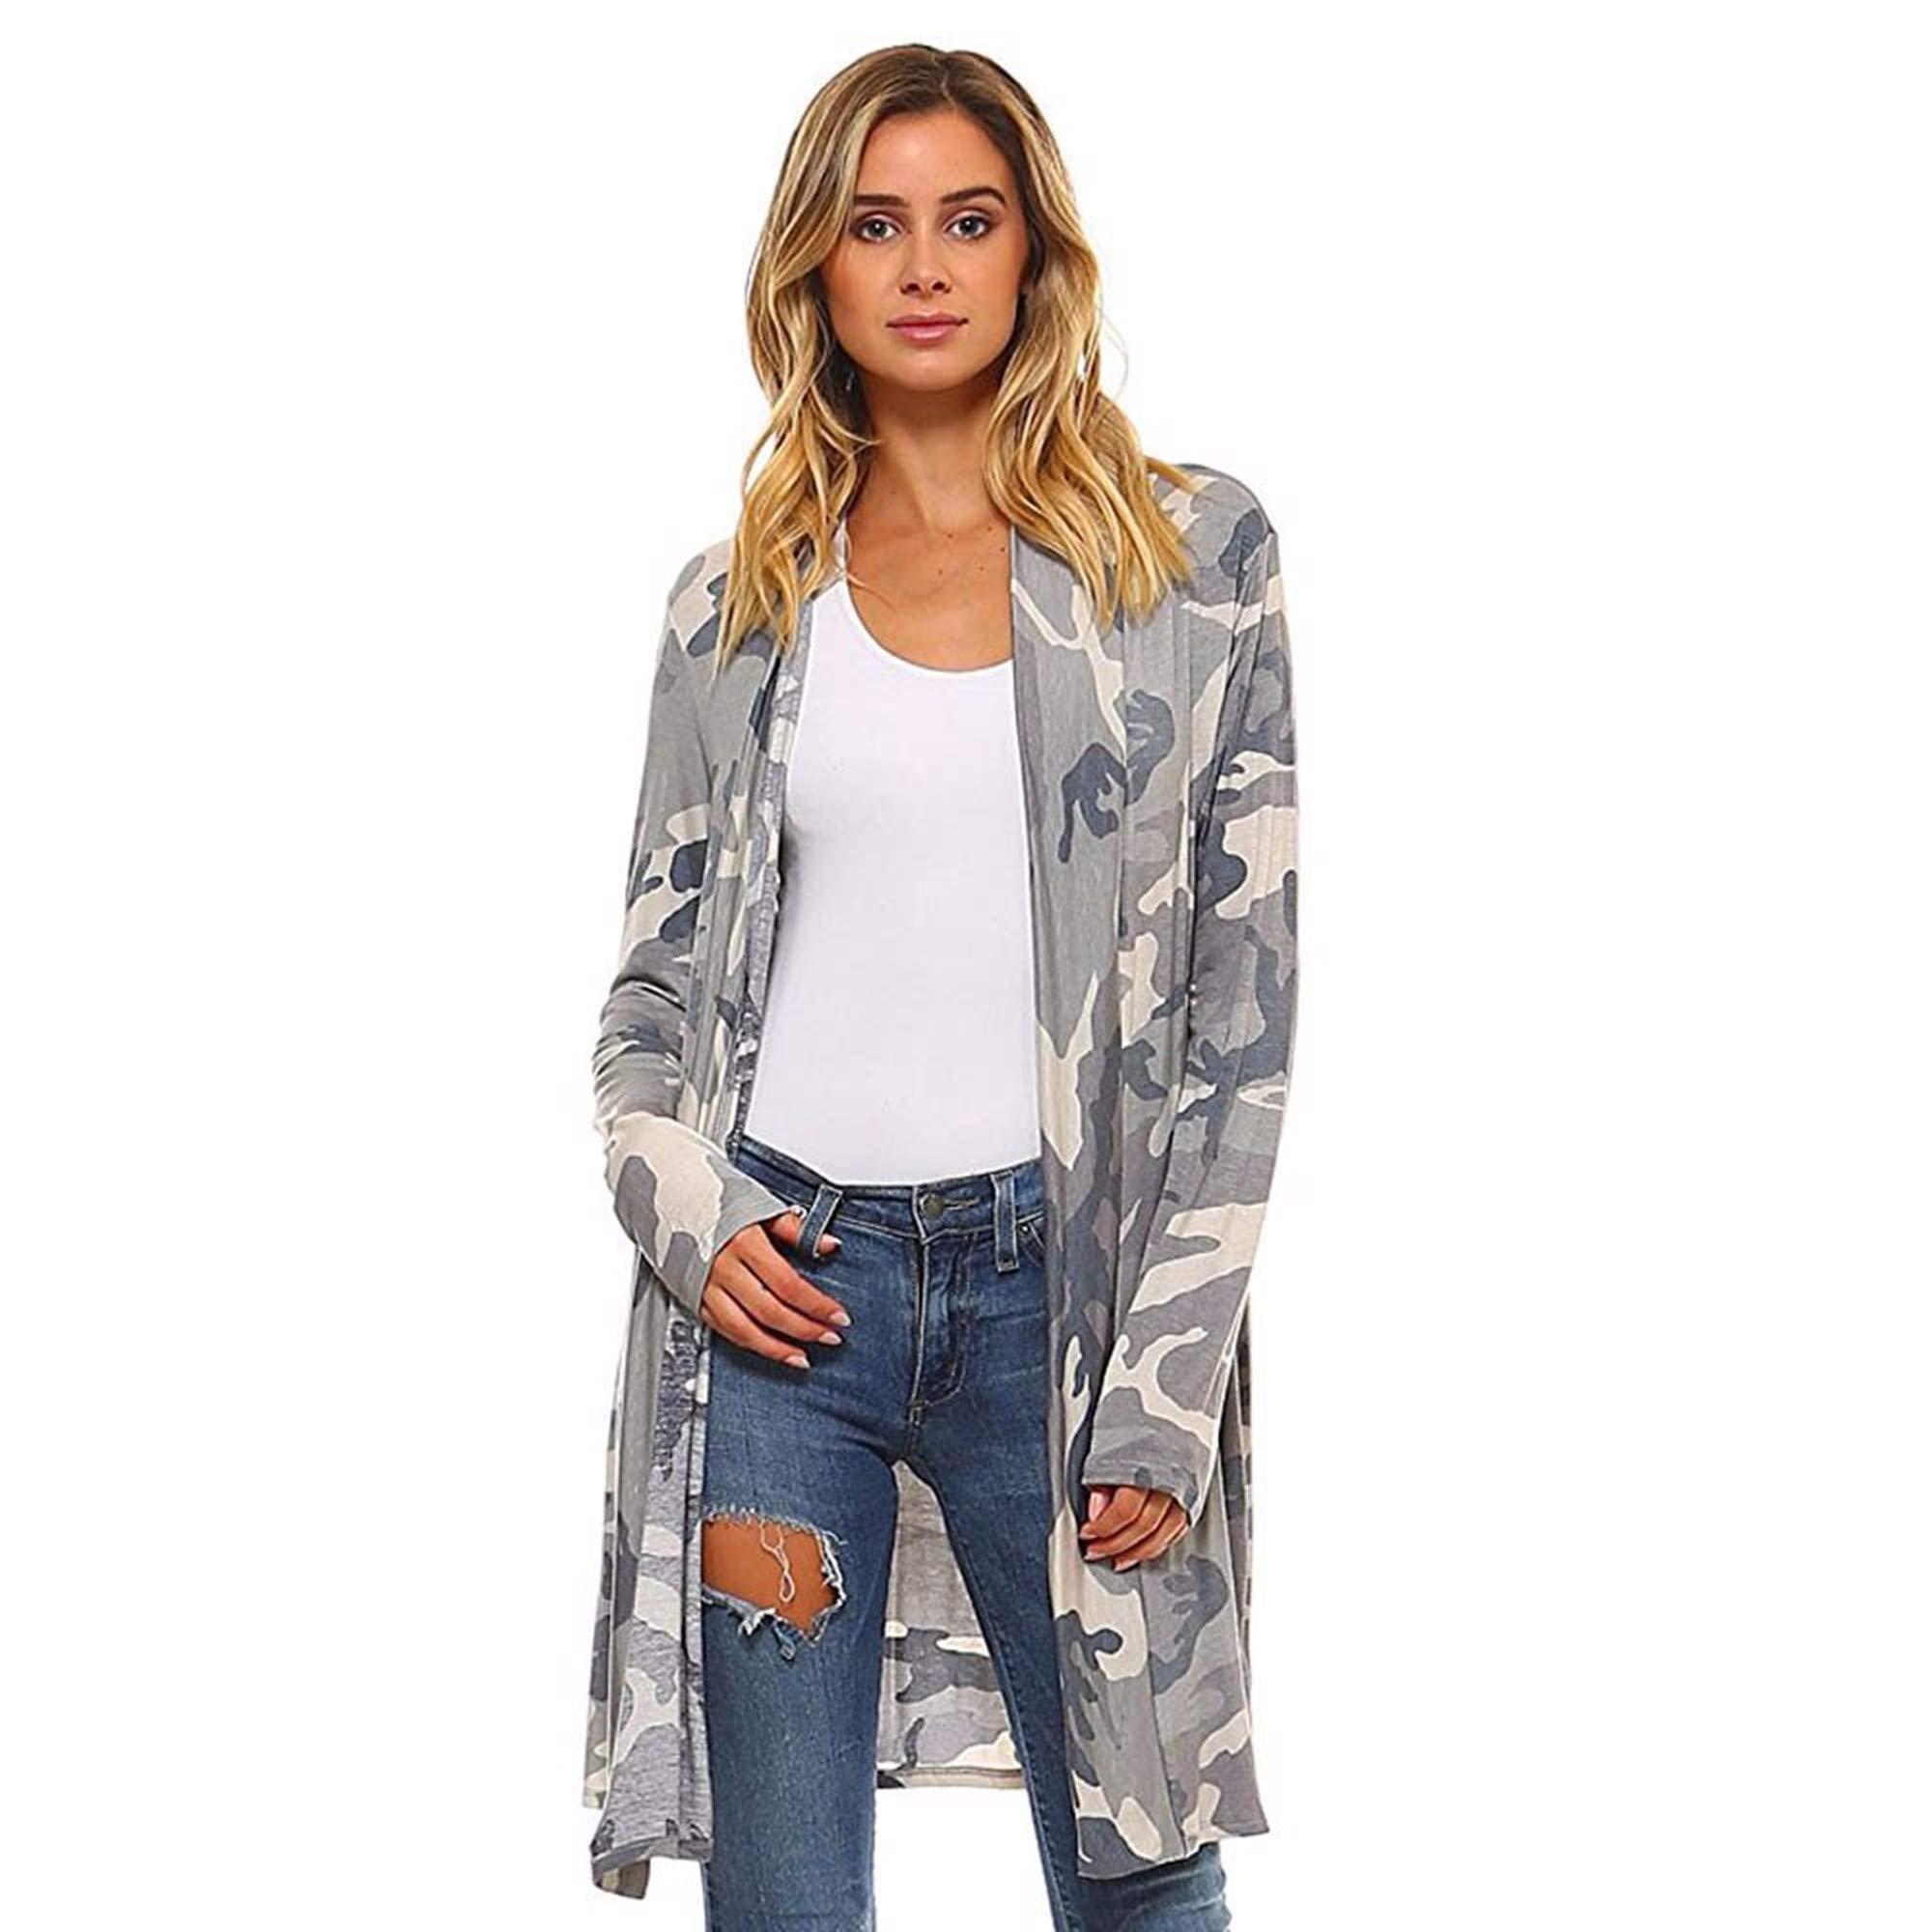 BCDshop Women Camo Kimono Cardigan Top Cover up Loose Boho Shawl Long Sleeve Blouse Coat Outwear (Asian Size:S US Size:10)